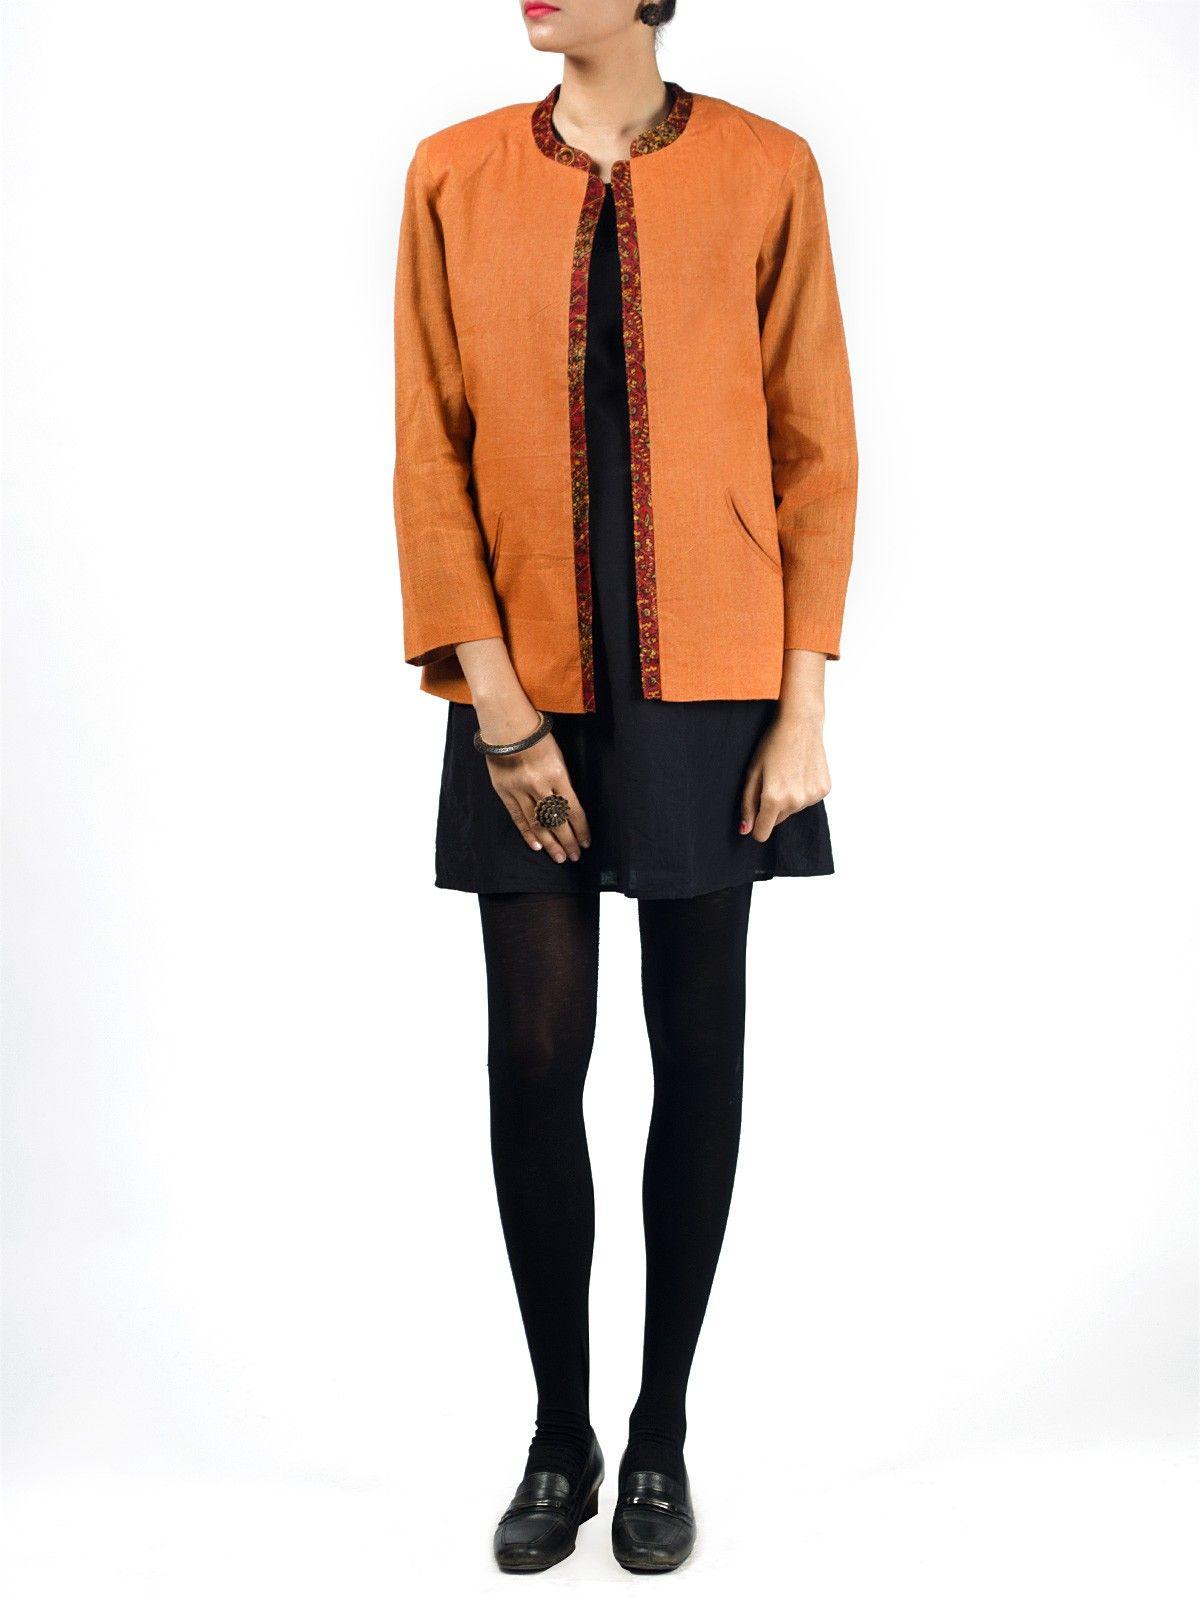 Peach linen full sleeves front open short winter jacket